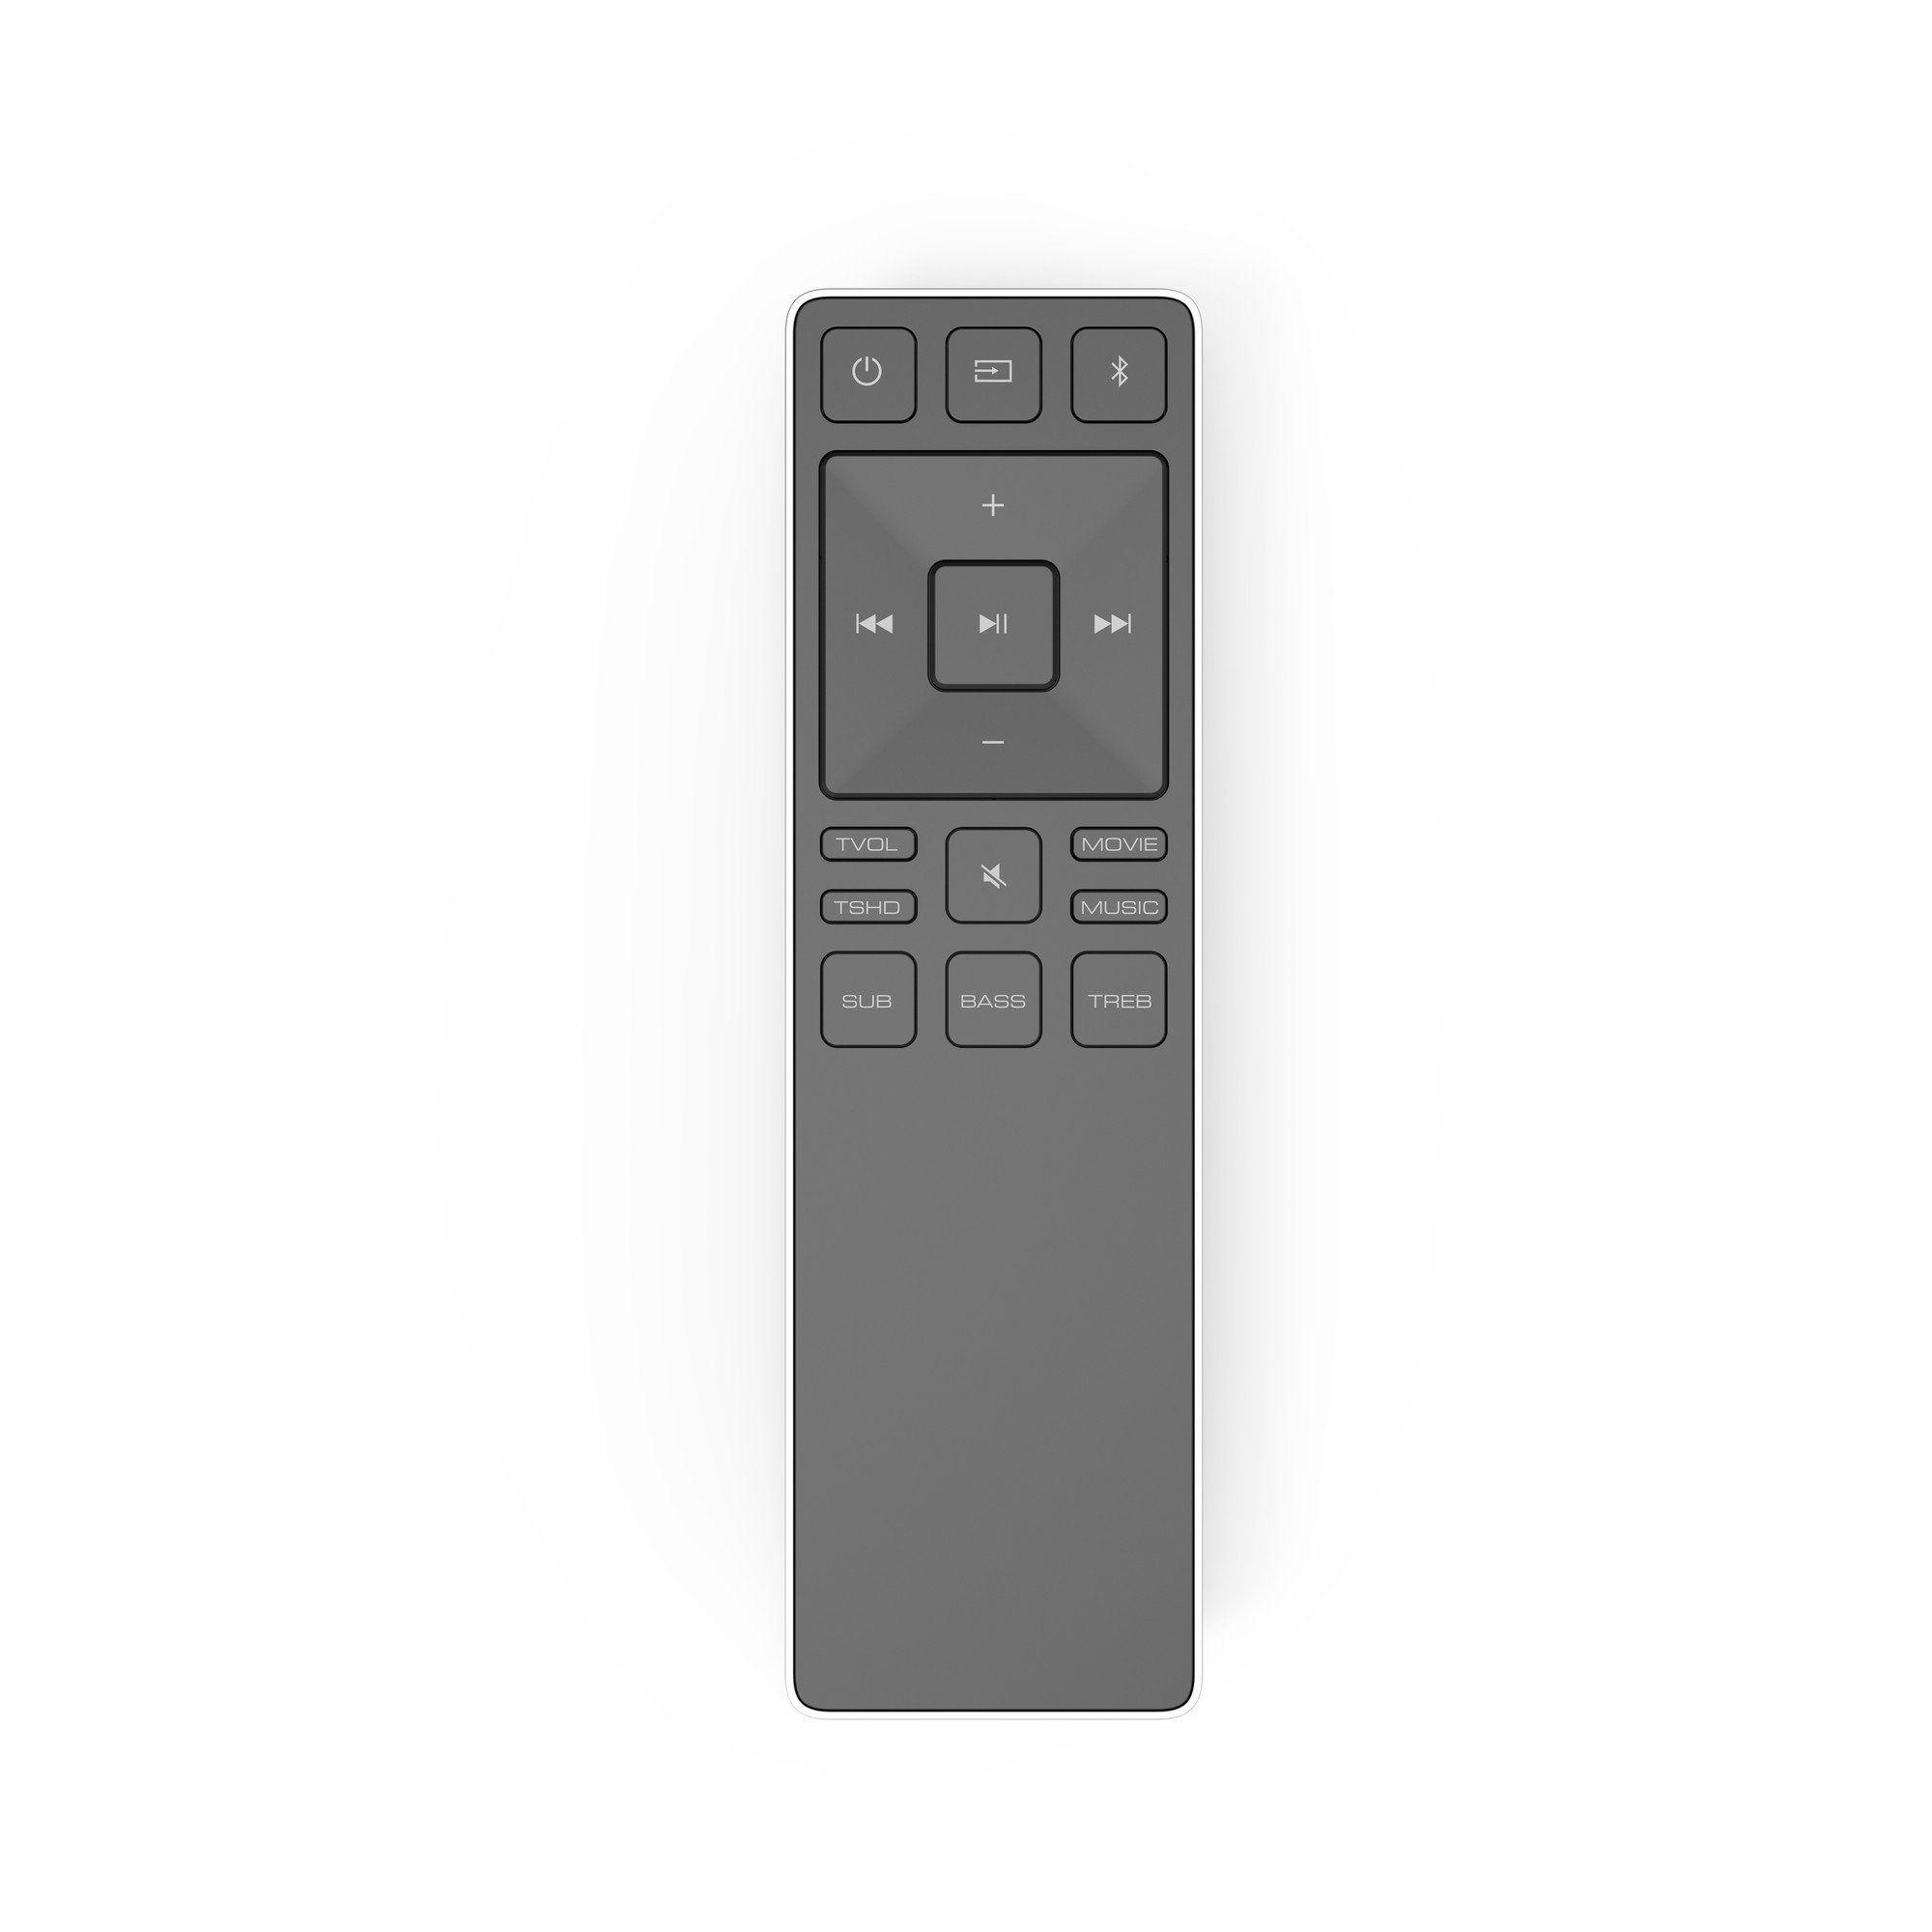 VIZIO SB2821D6 28Inch 2.1 Channel Sound bar * Find out